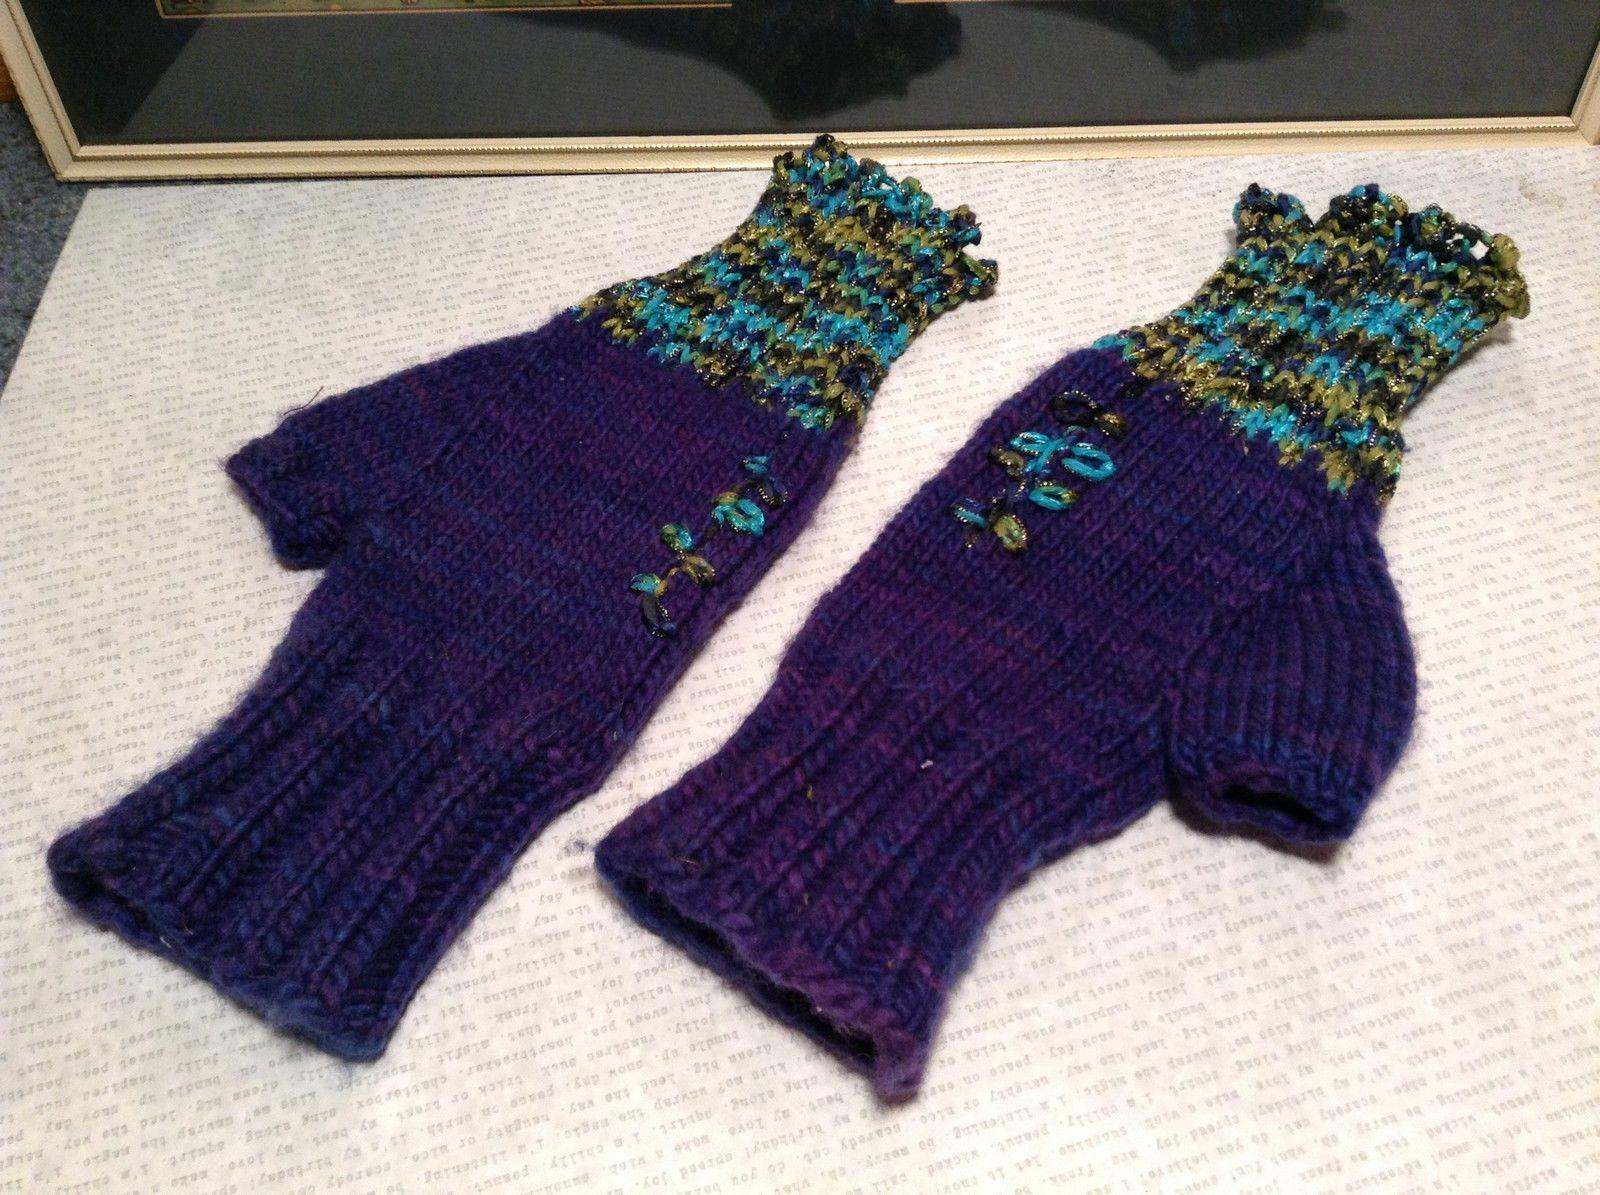 Purple Green Blue Hand Knitted Woven Fingerless Gloves Very Soft